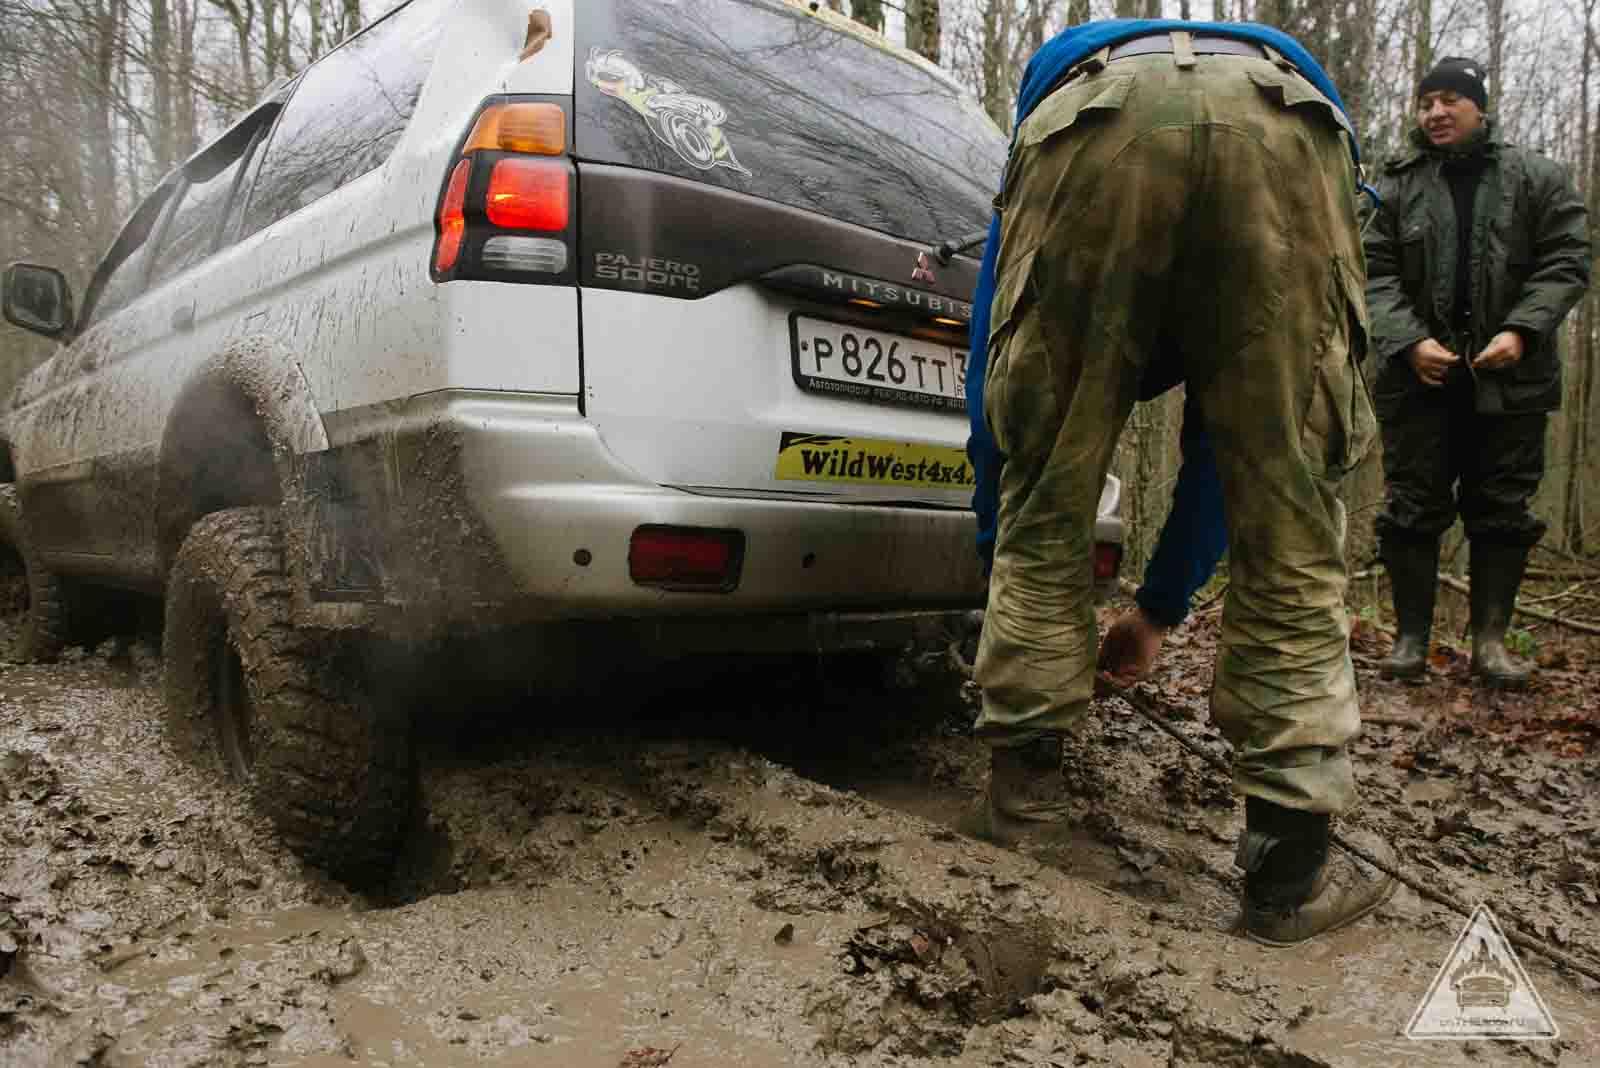 лебедка спасает джип из грязи